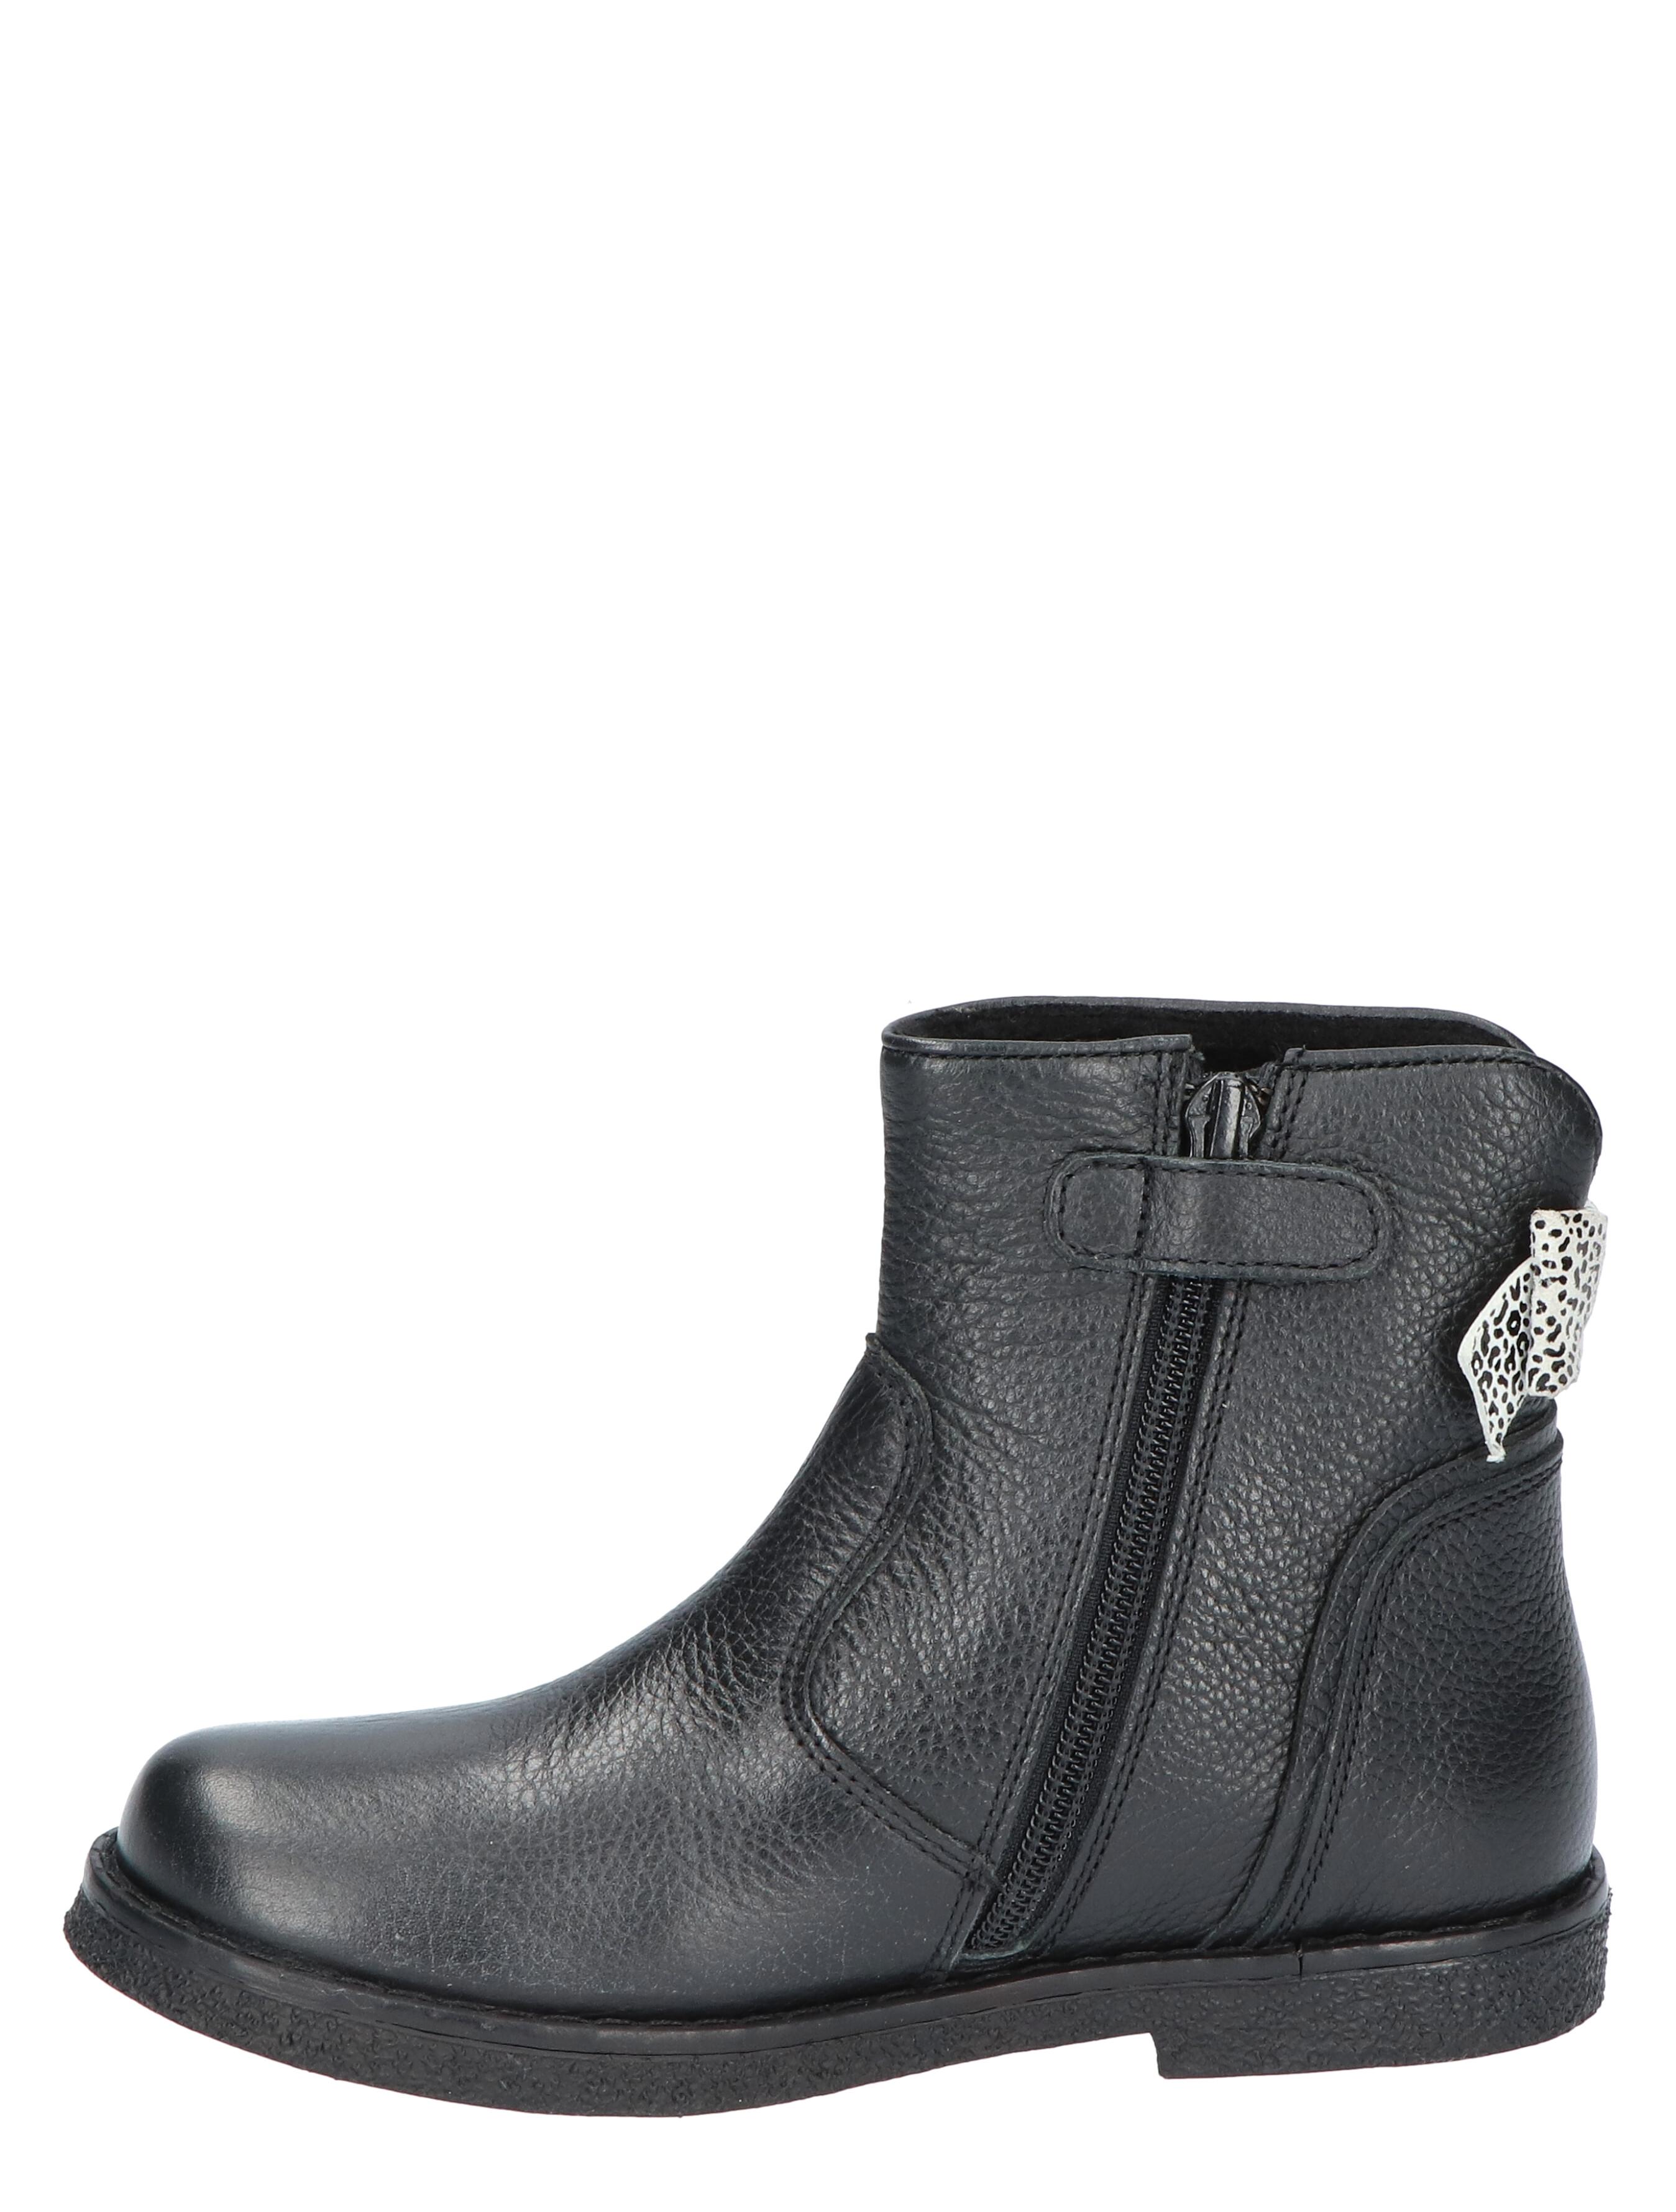 Cypres Lenneke Sabrina Black Boots